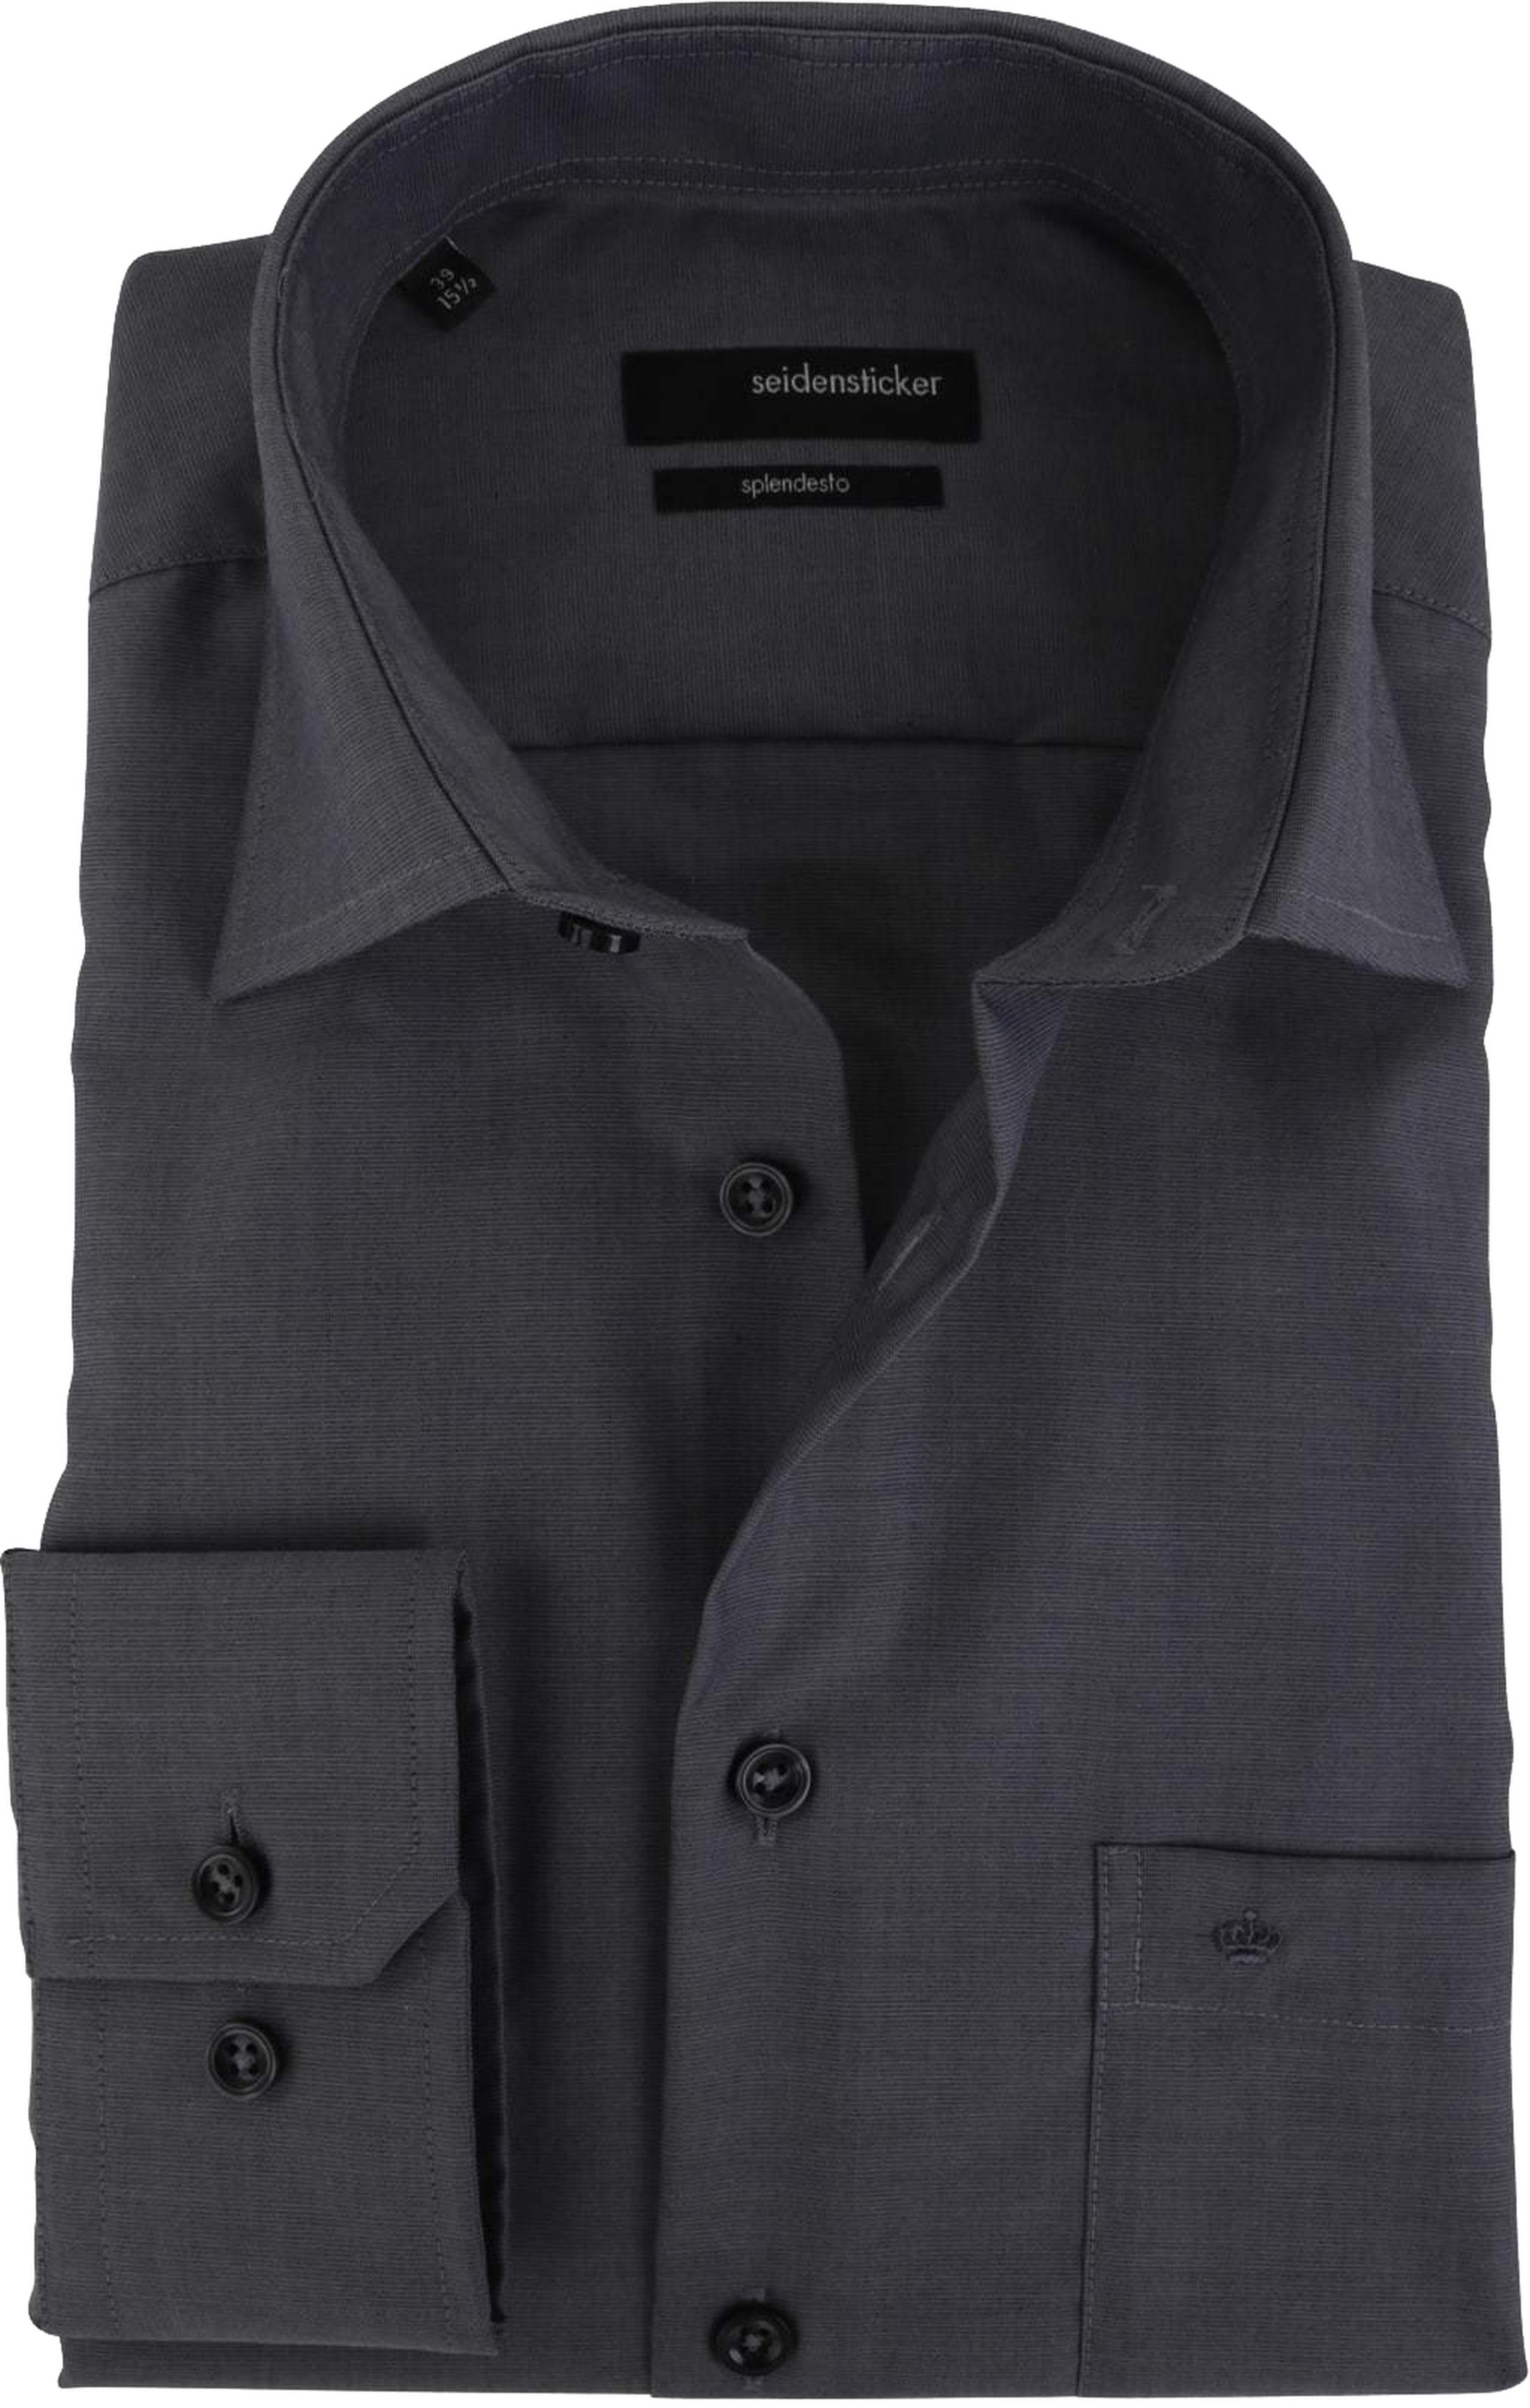 Seidensticker Overhemd Regular Fit Antraciet foto 0